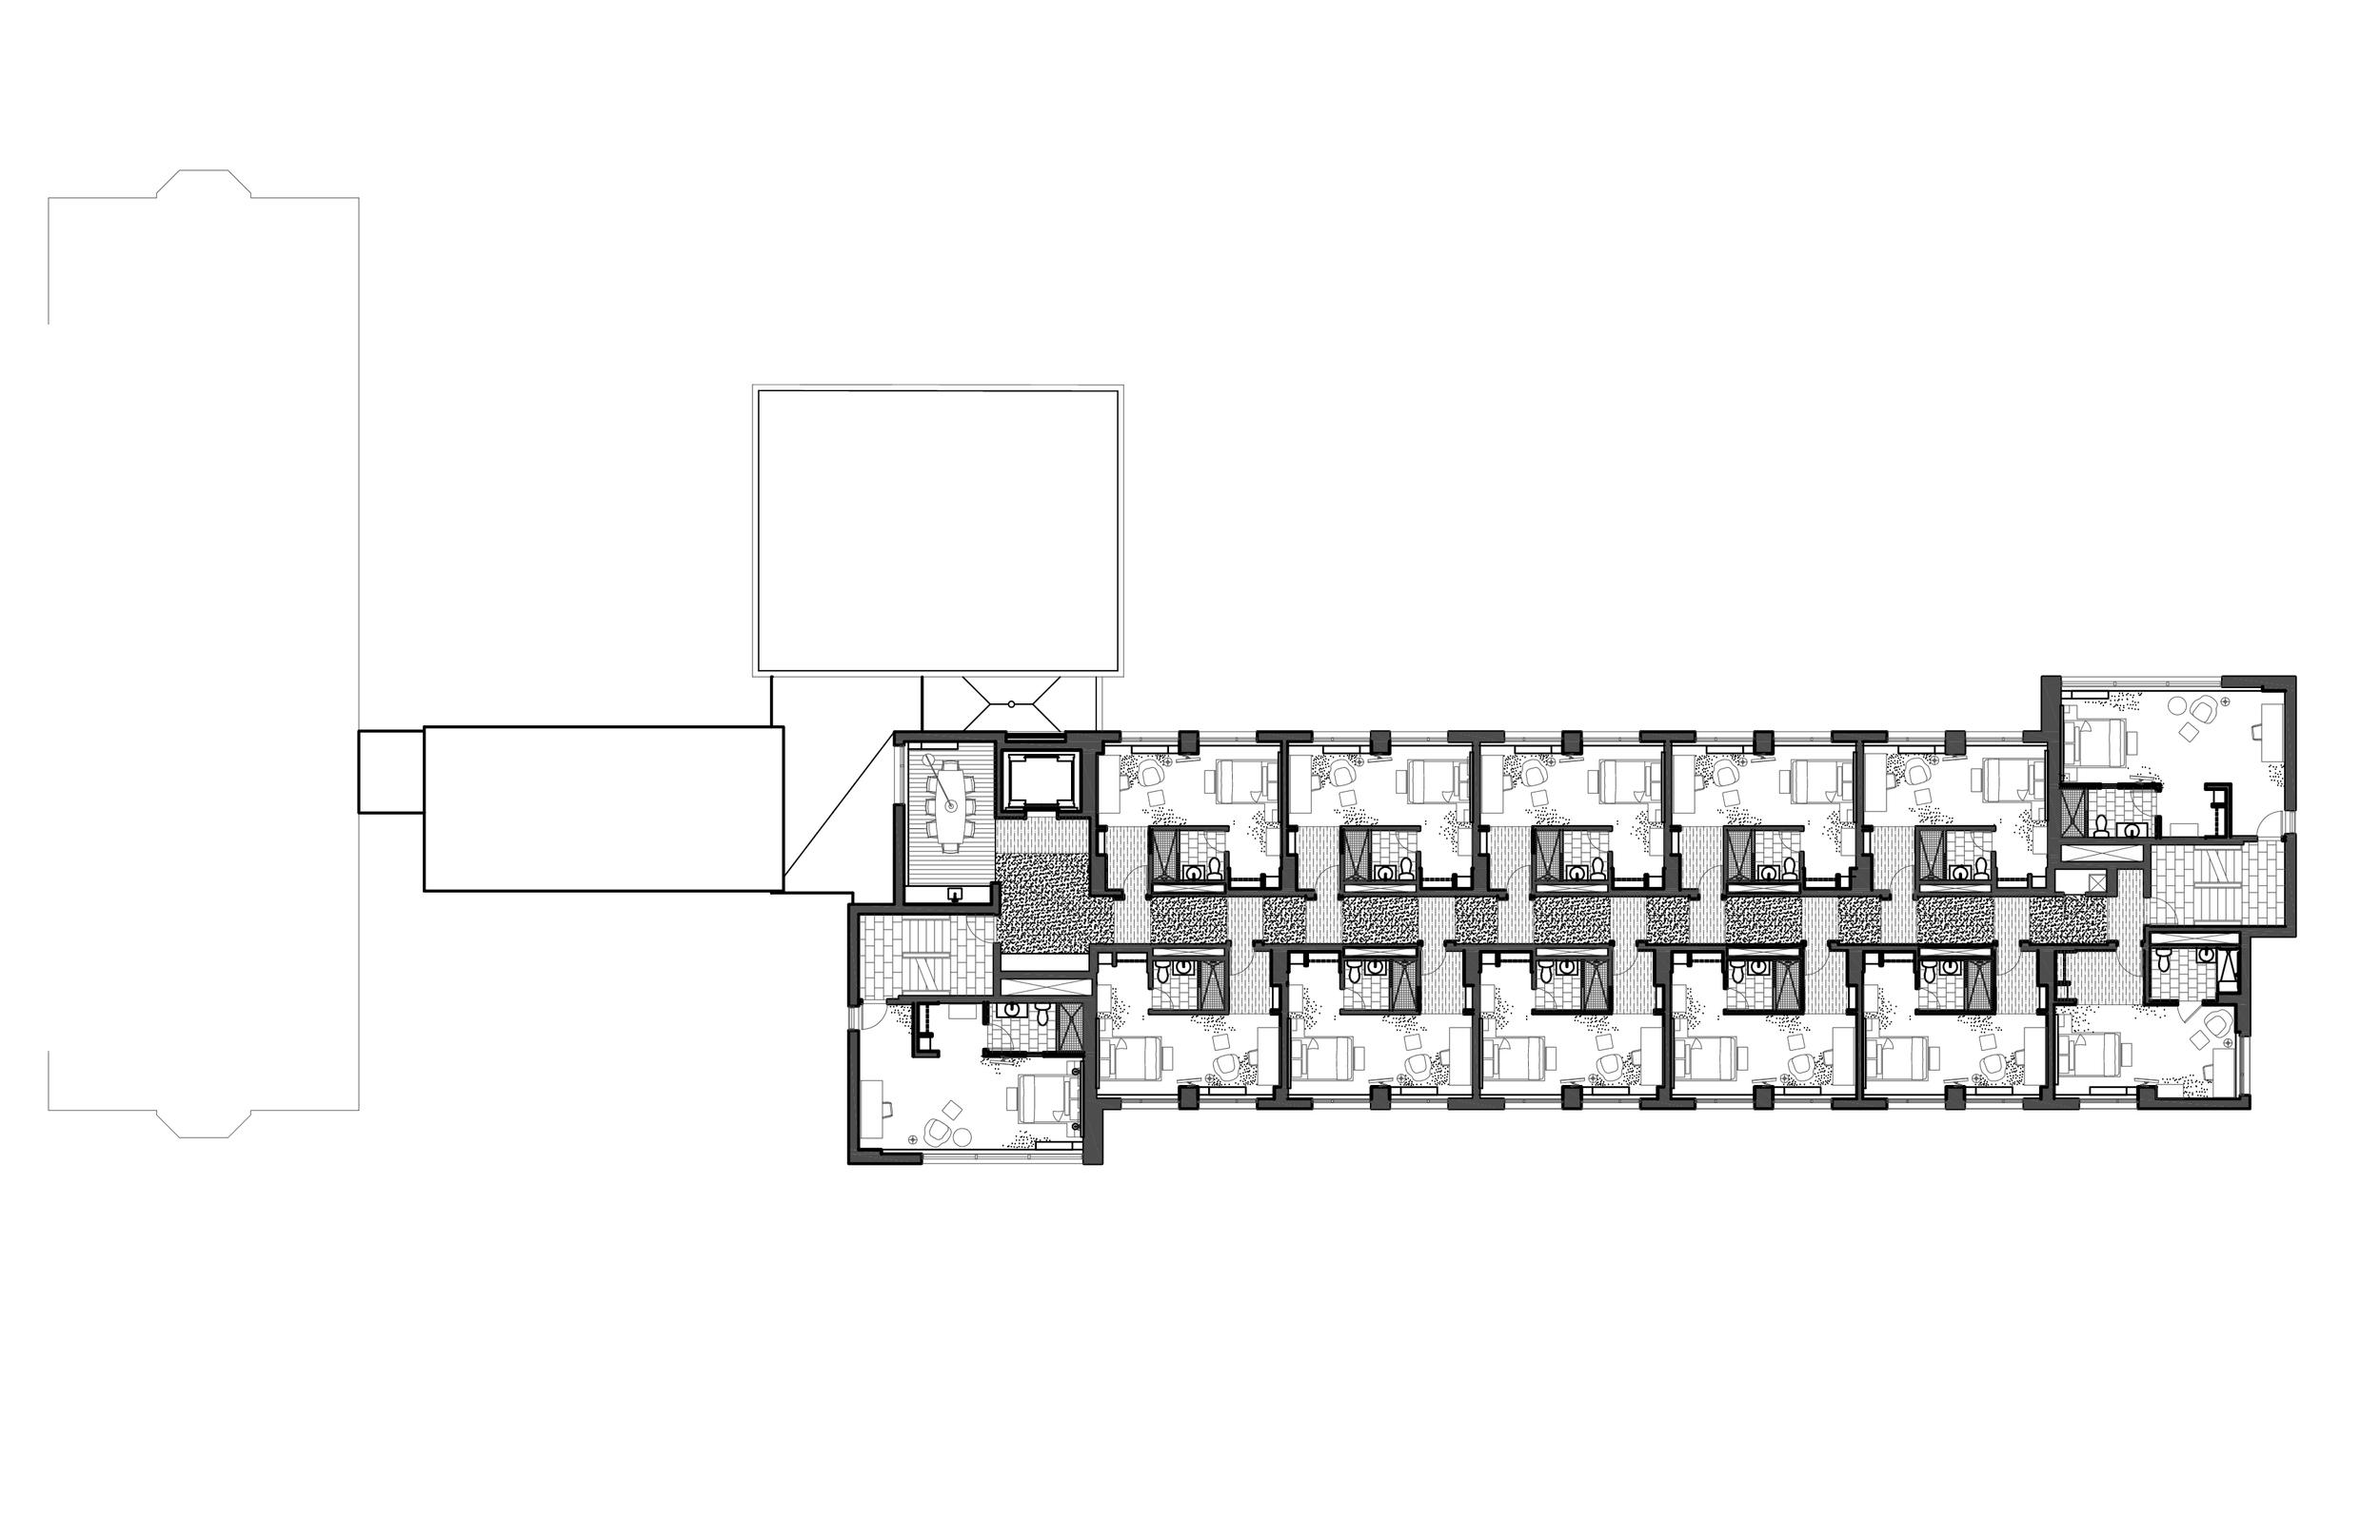 Buchanan Hall level 2 plan